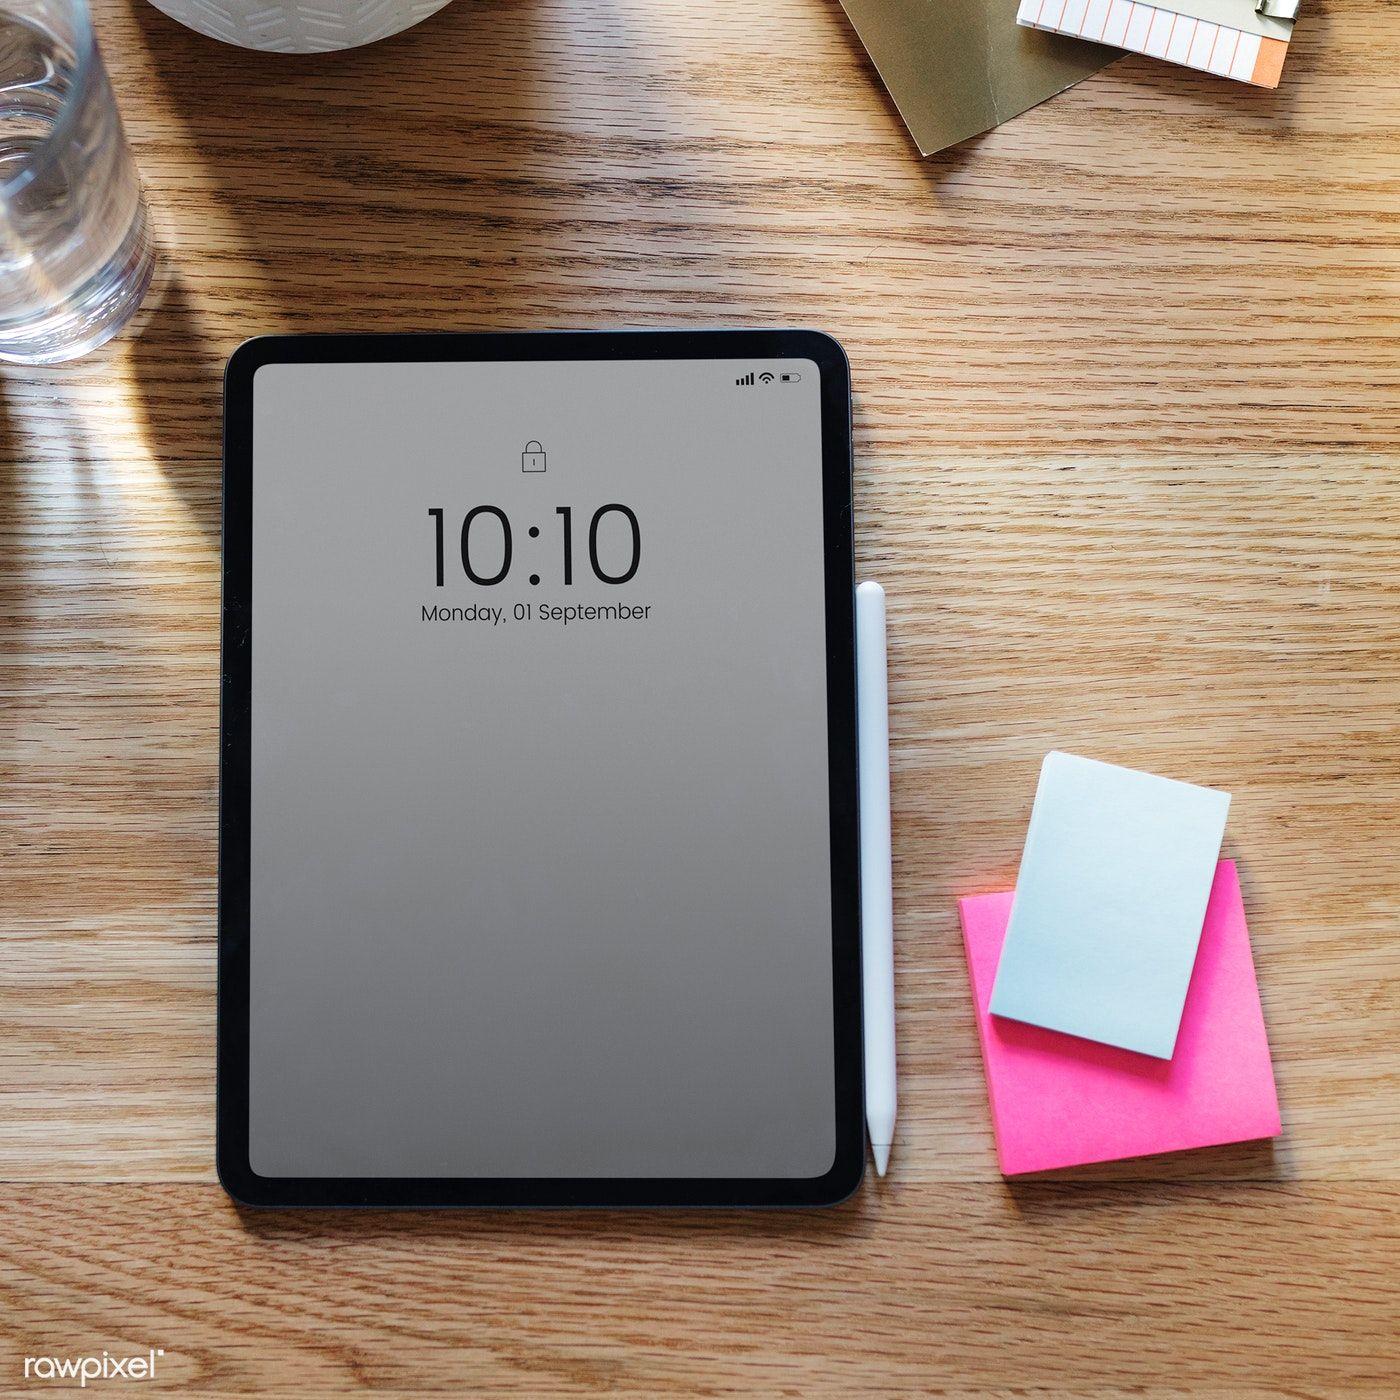 Download premium photo of Digital tablet mockup on a